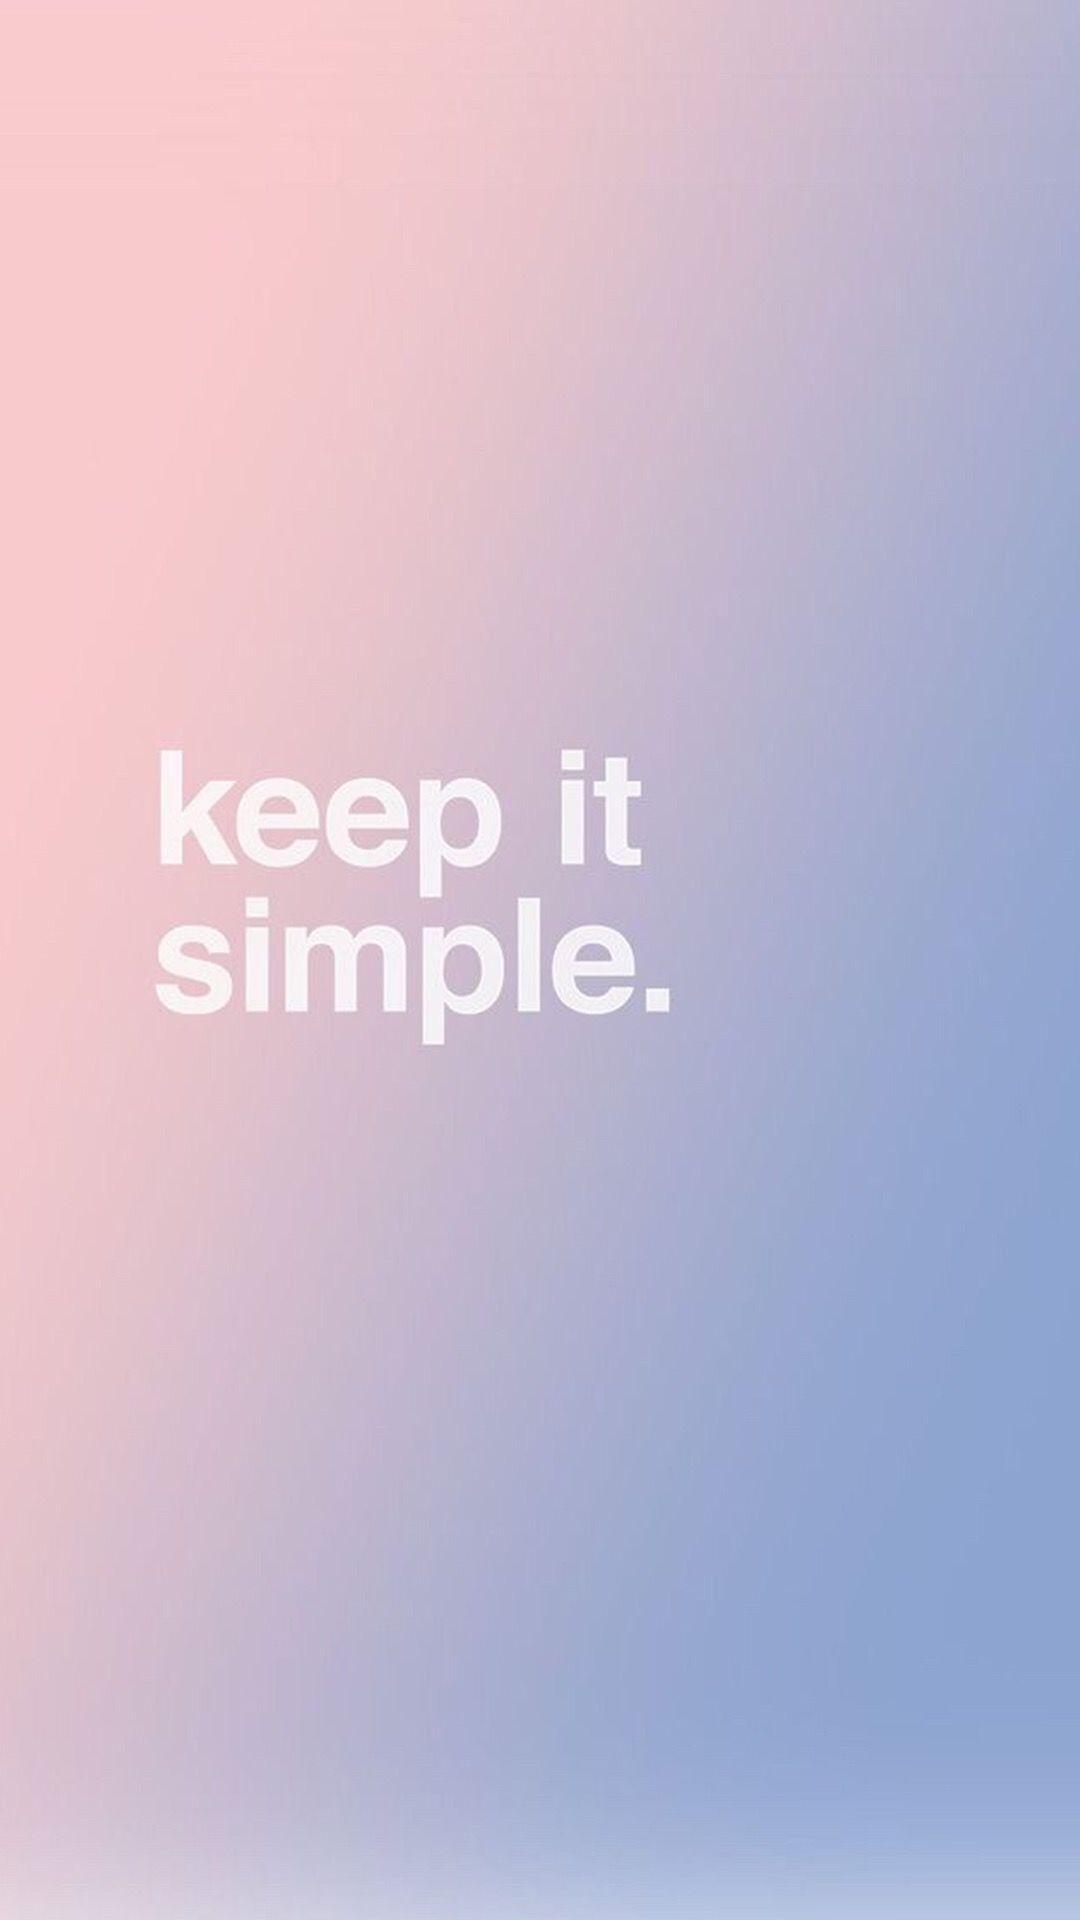 Keep it simple. Planos de fundo, Walpapers cute, Papeis